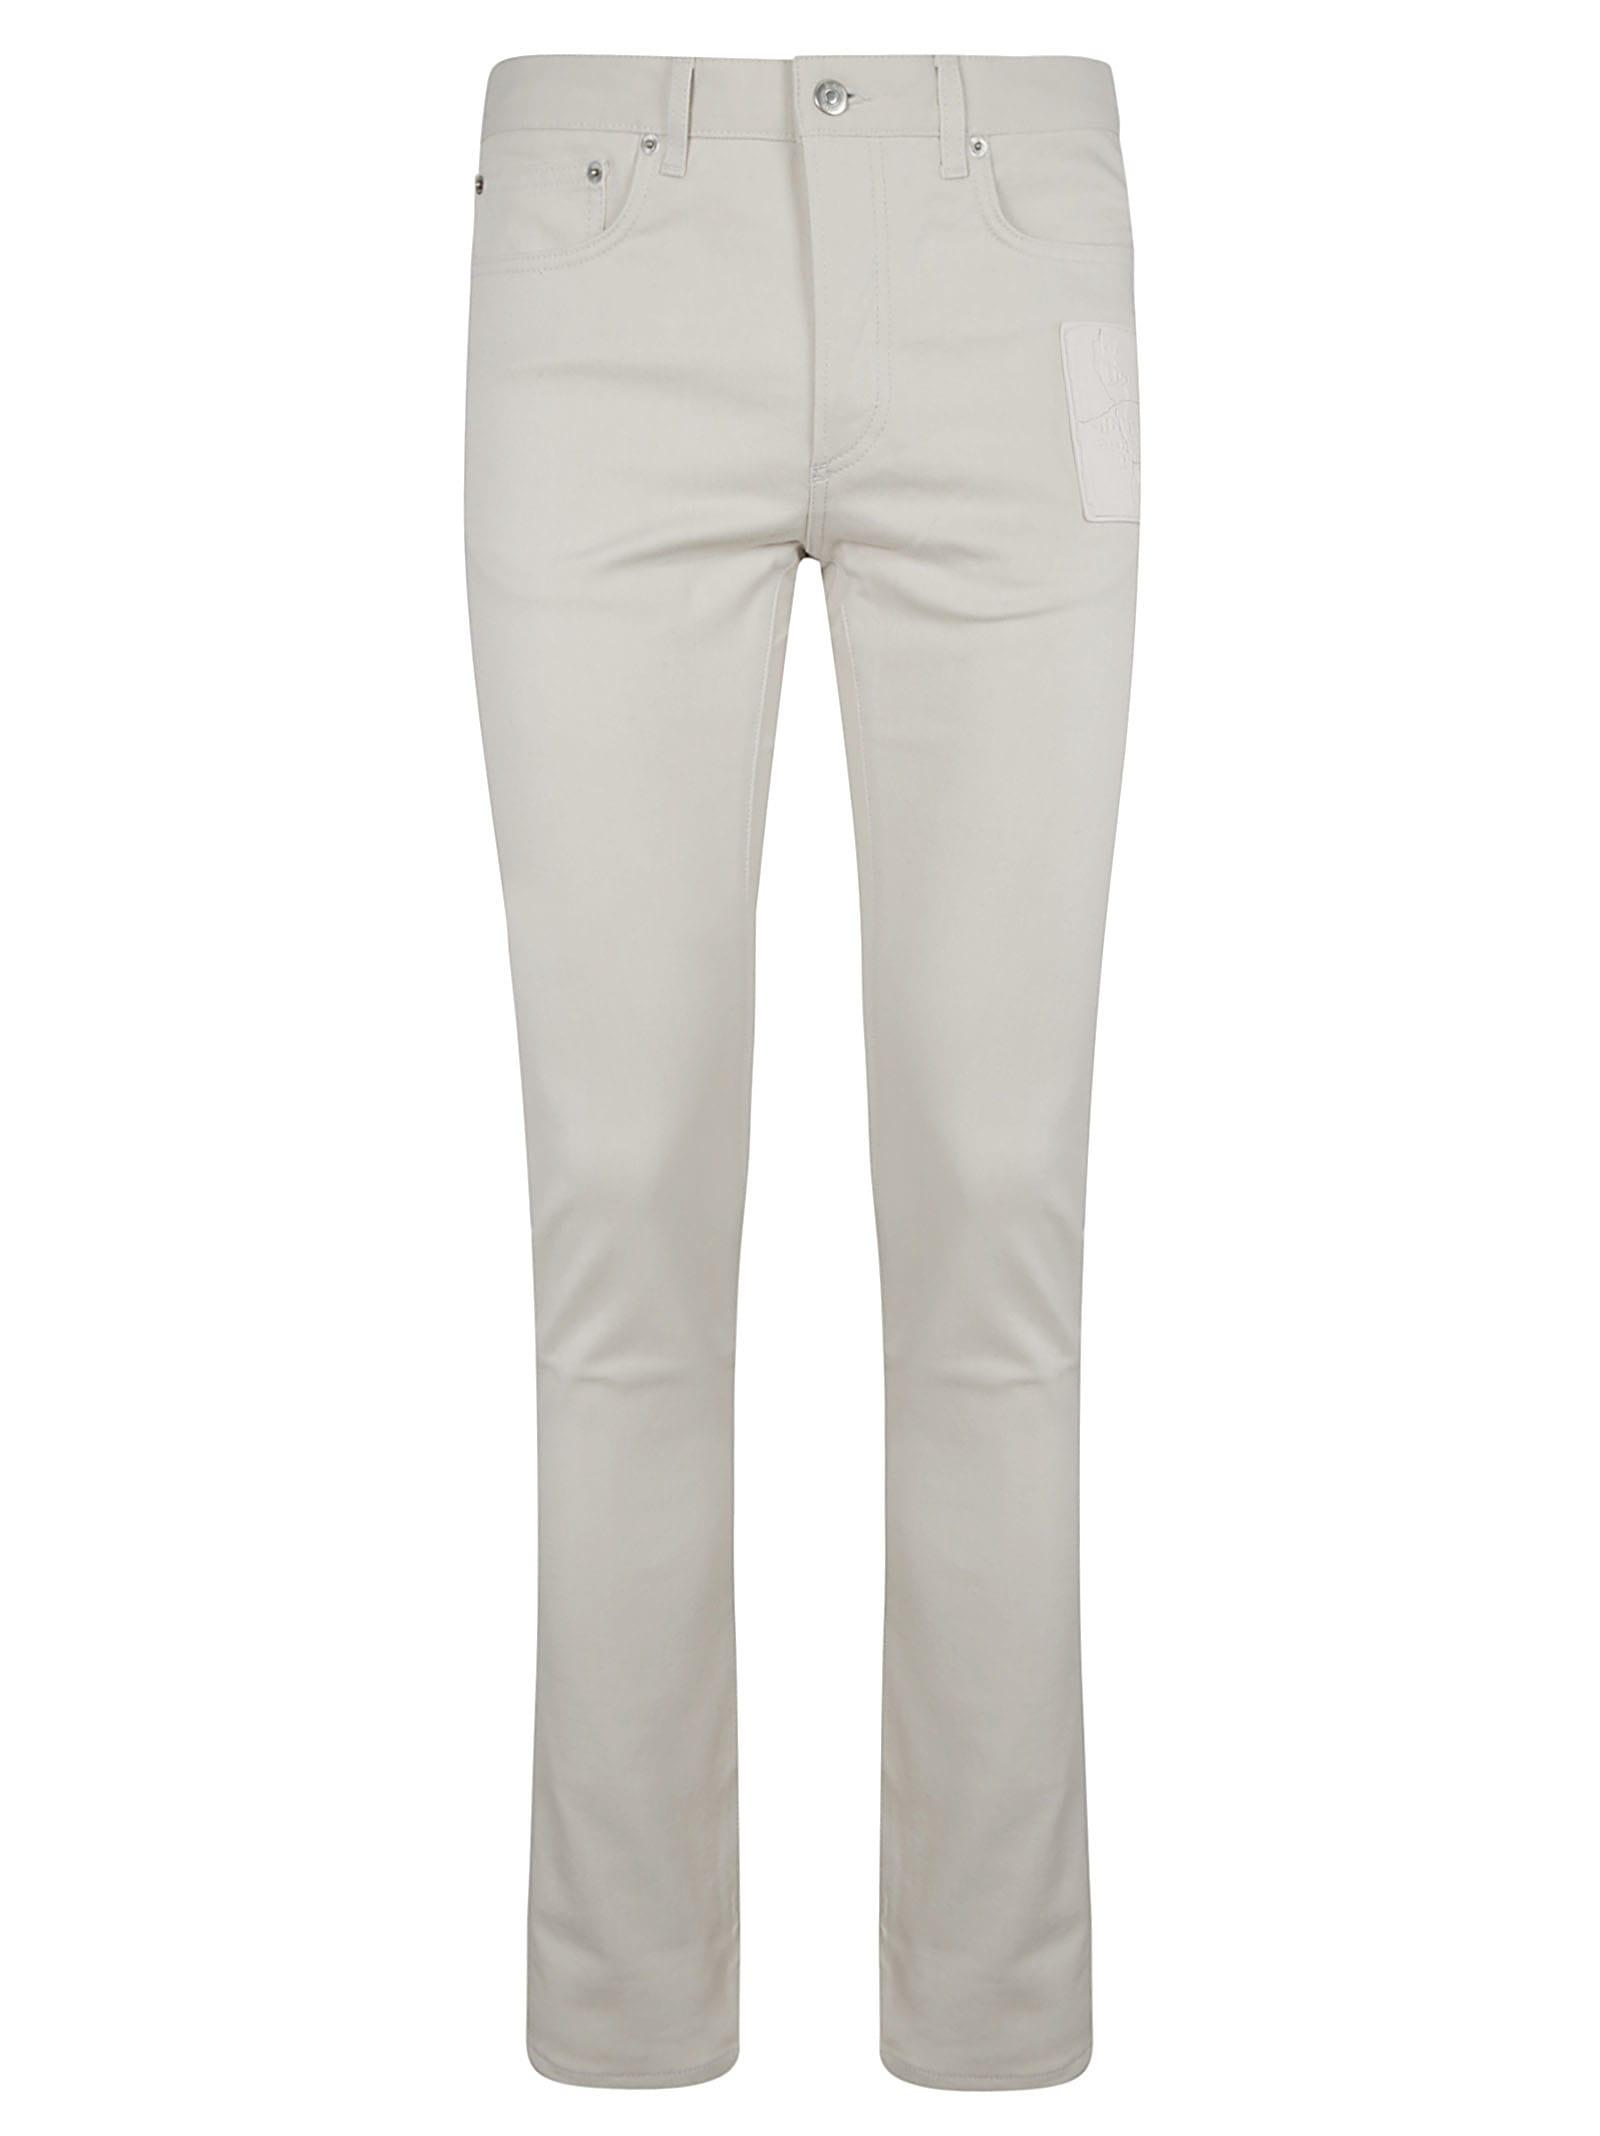 Dior Homme Slim Flared Jeans